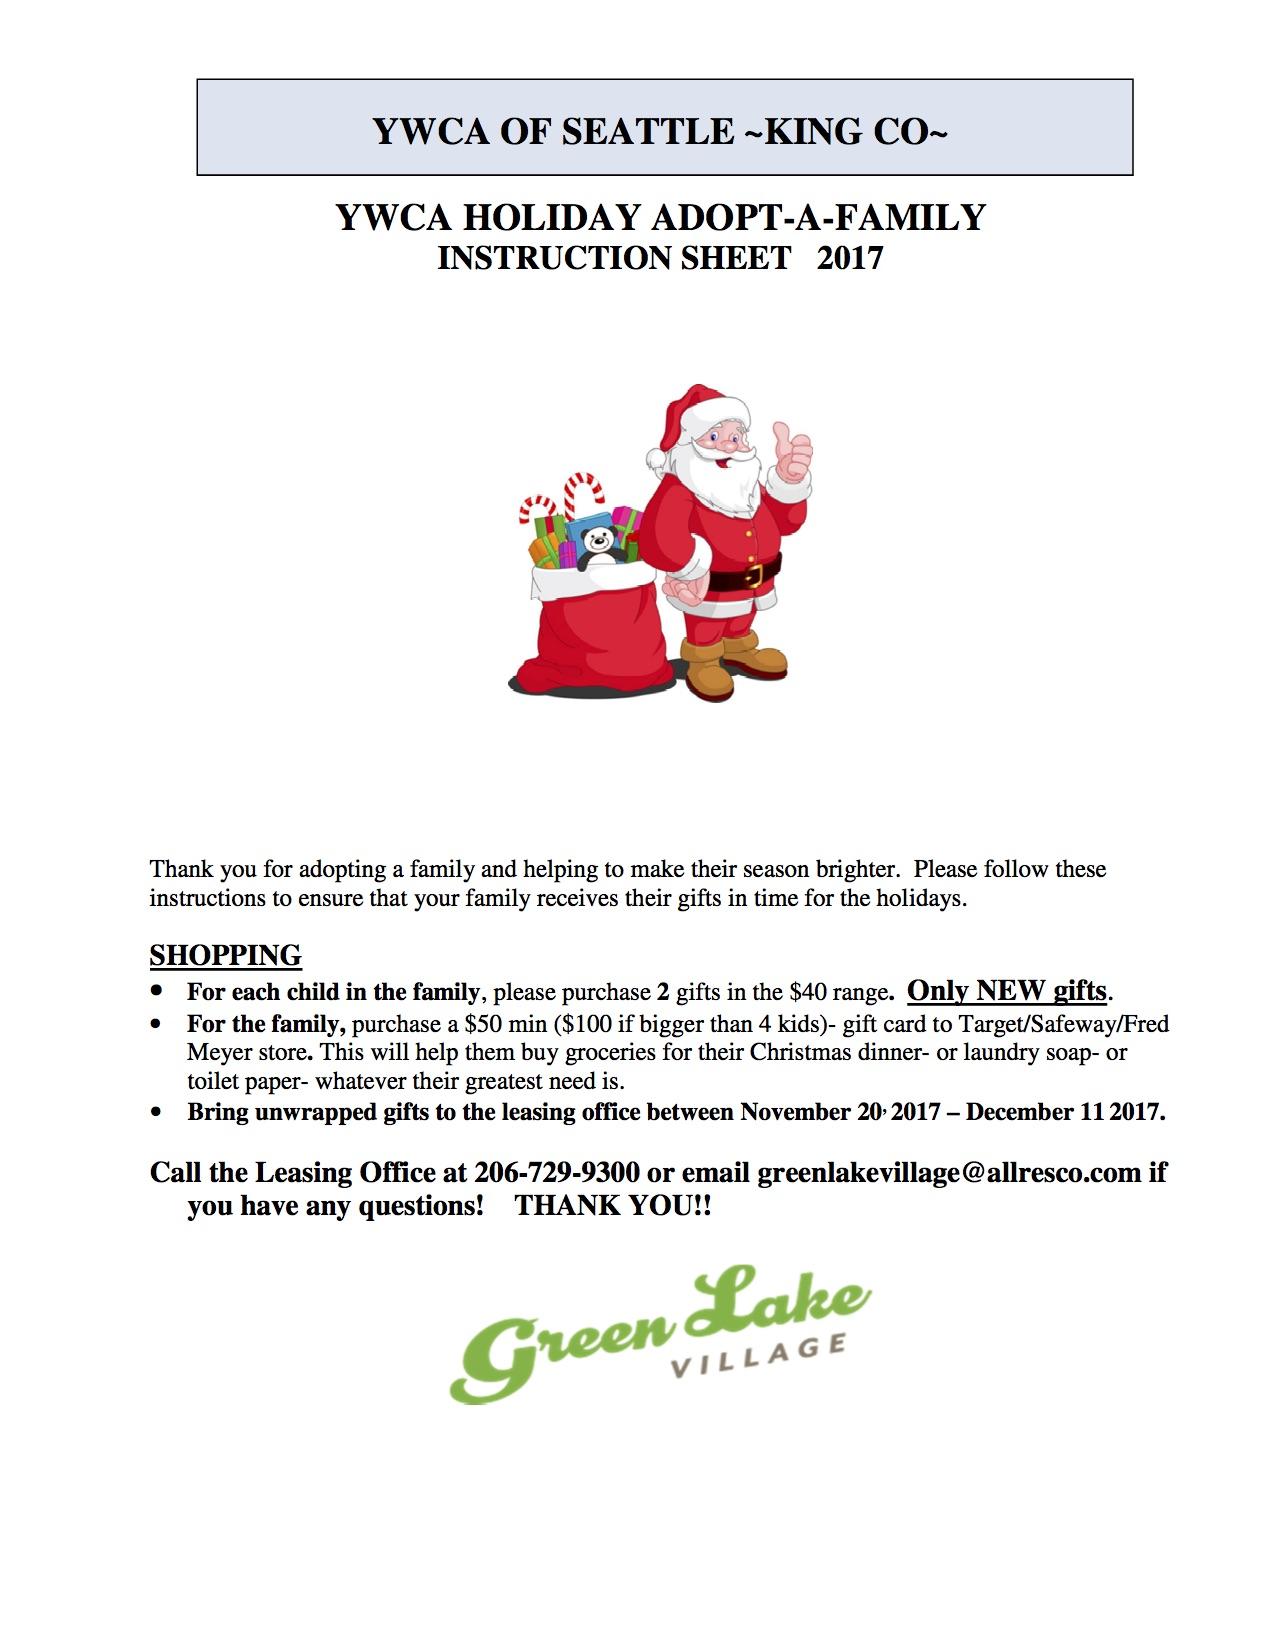 Resident Reviews of Green Lake Village